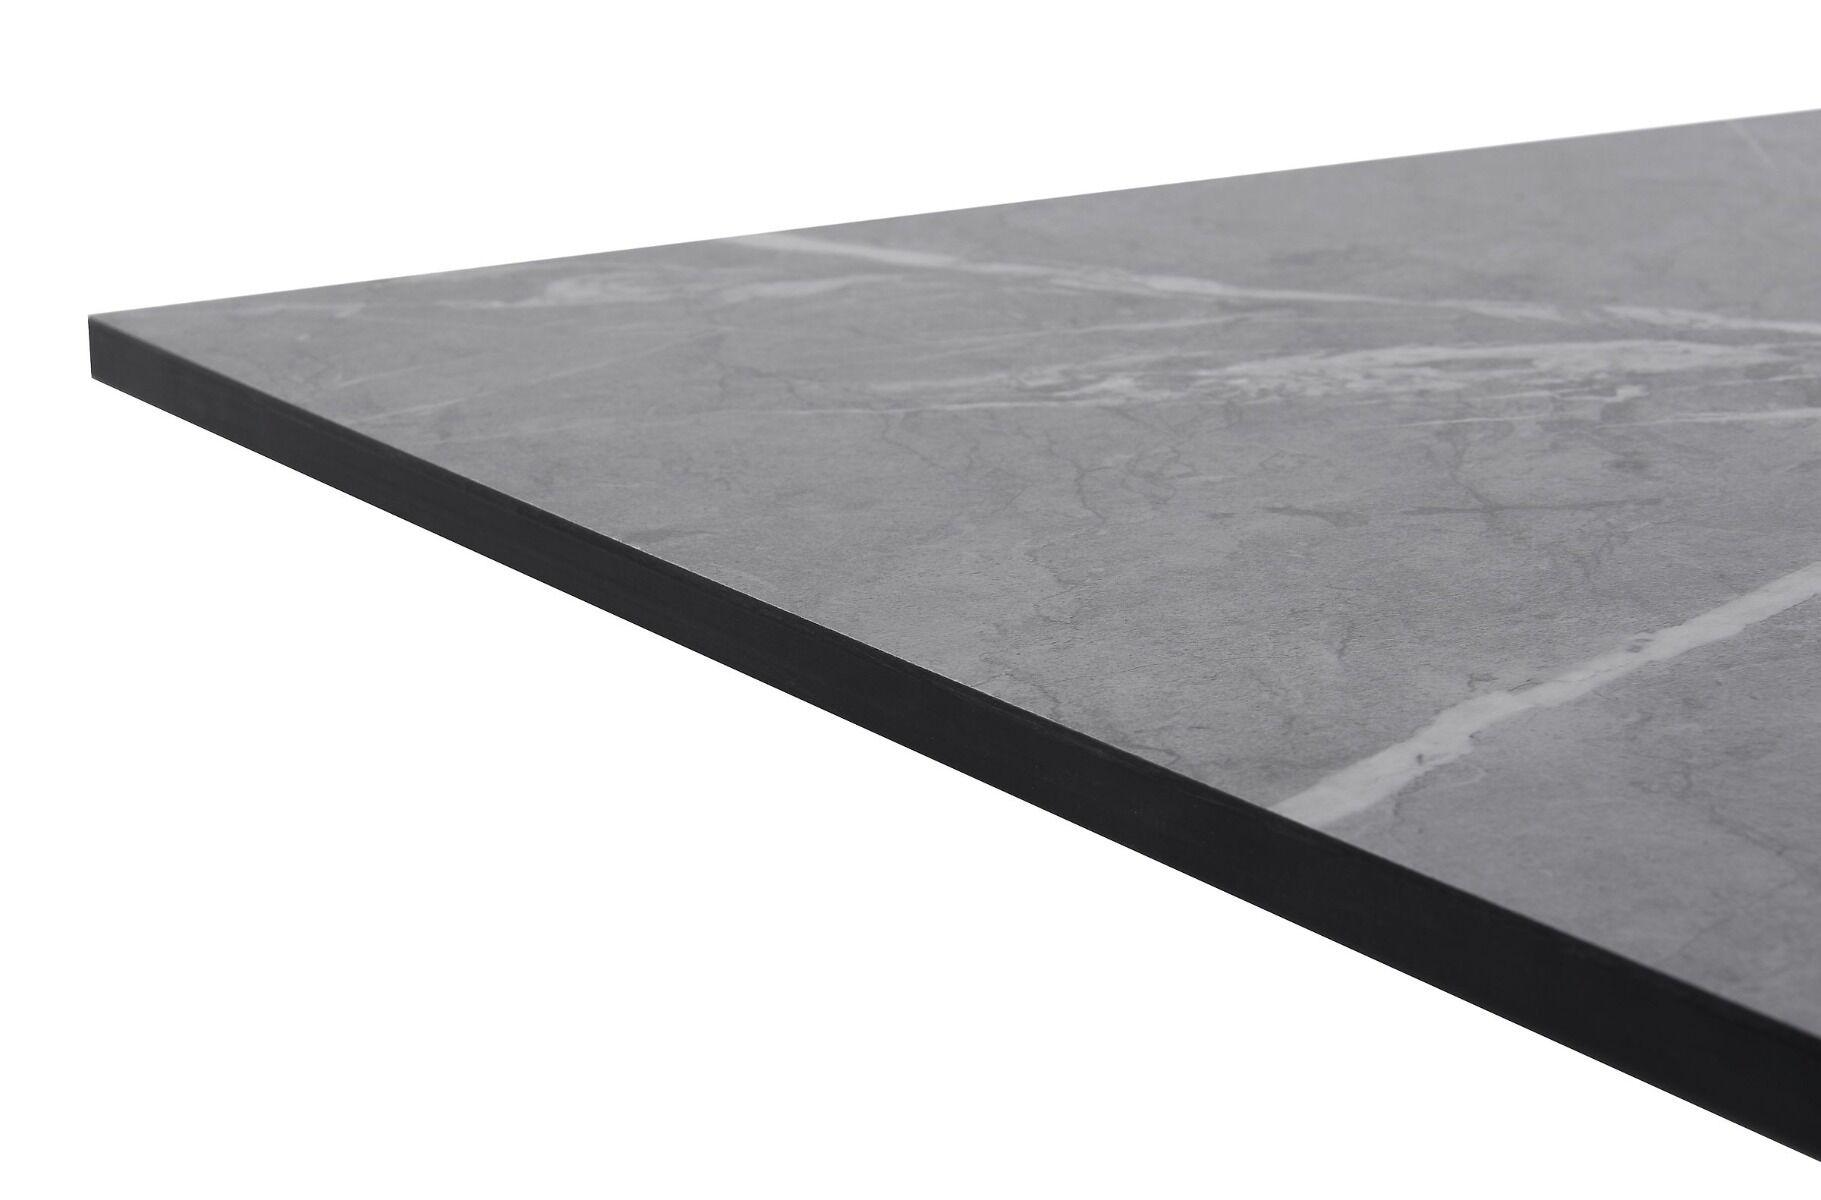 Blat Teo 70x70 cm